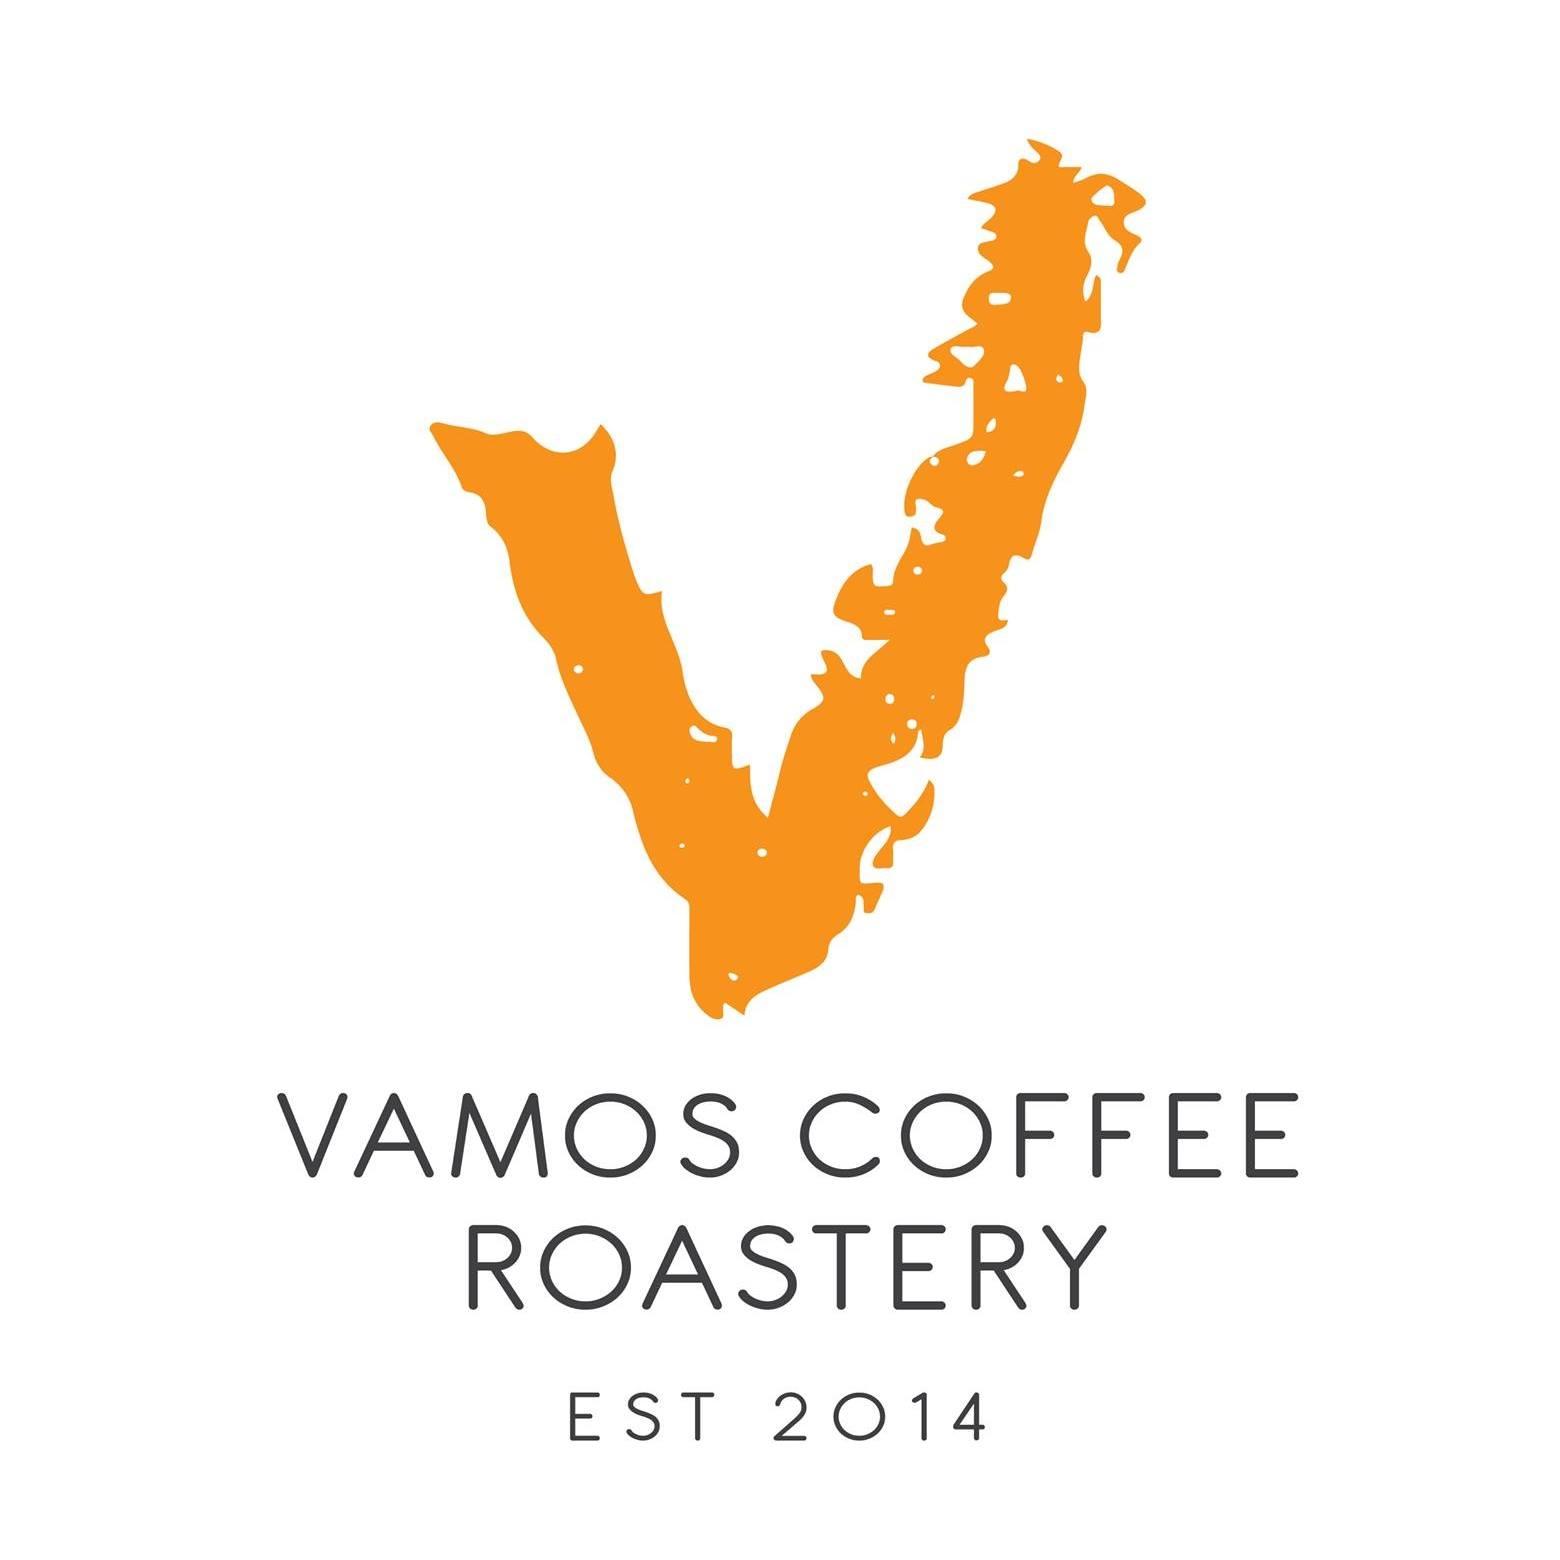 Vamos Coffee Roastary